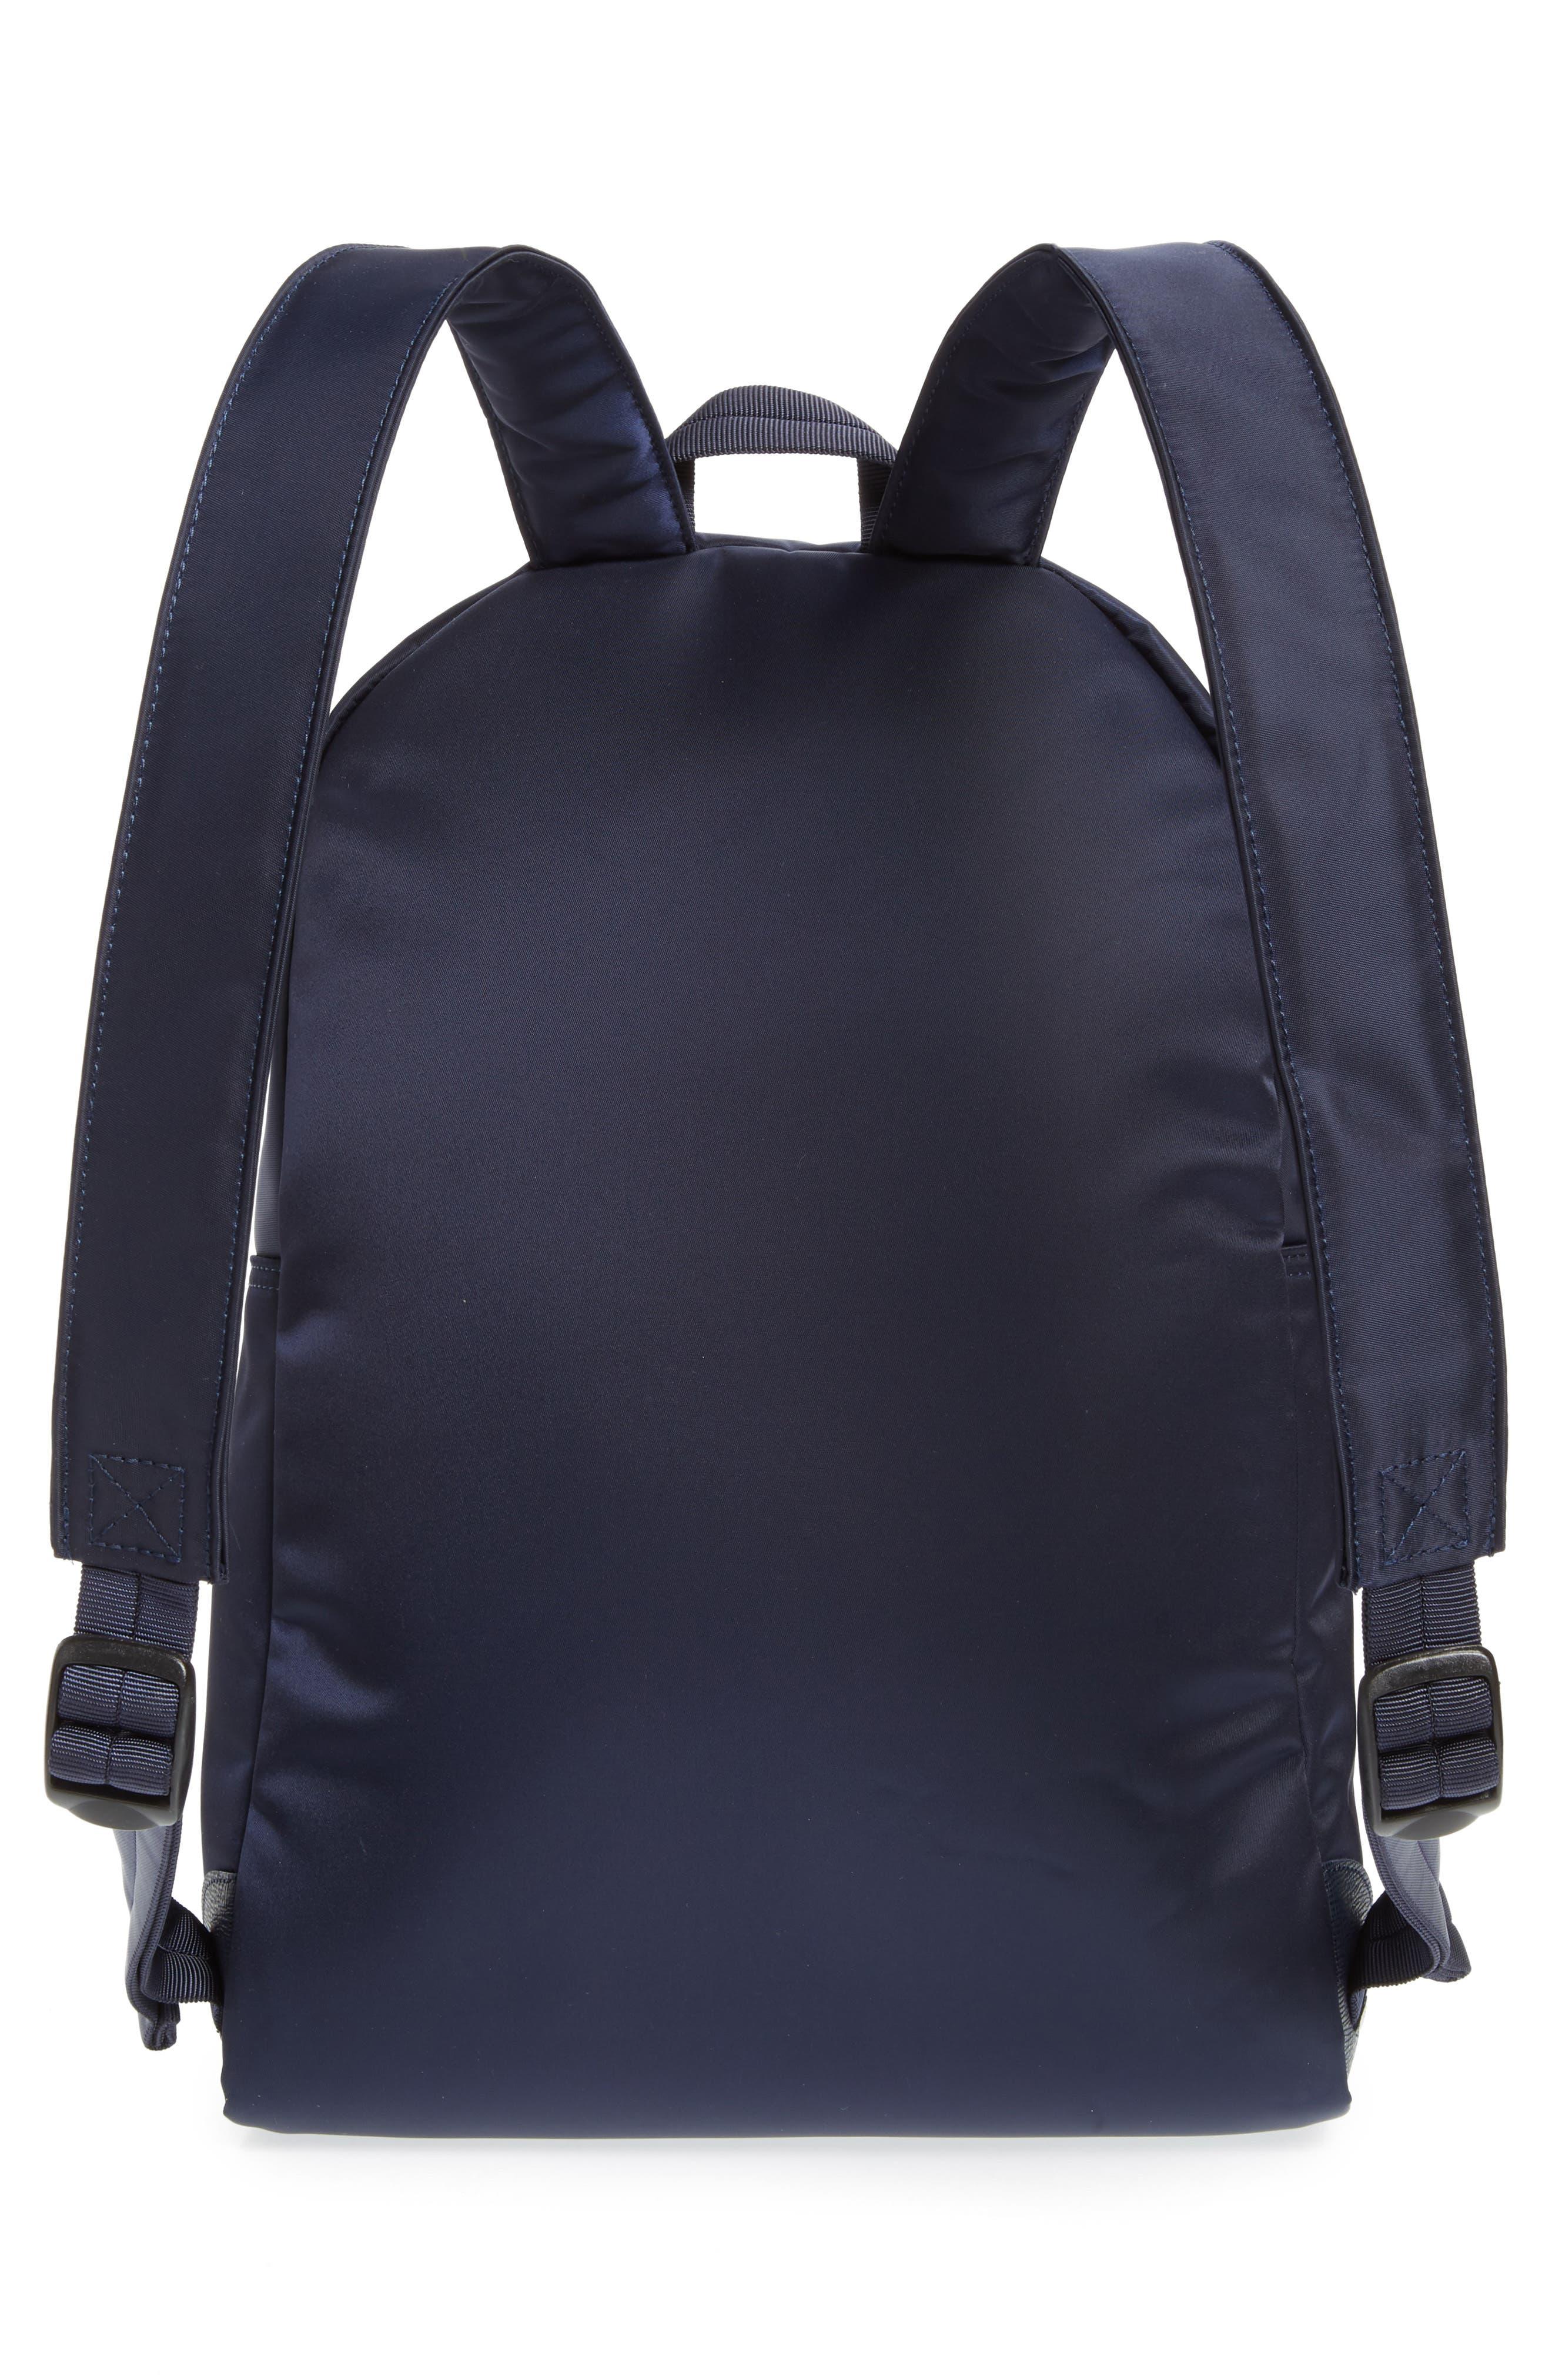 'Le Pliage Neo' Nylon Backpack,                             Alternate thumbnail 3, color,                             NAVY BLUE